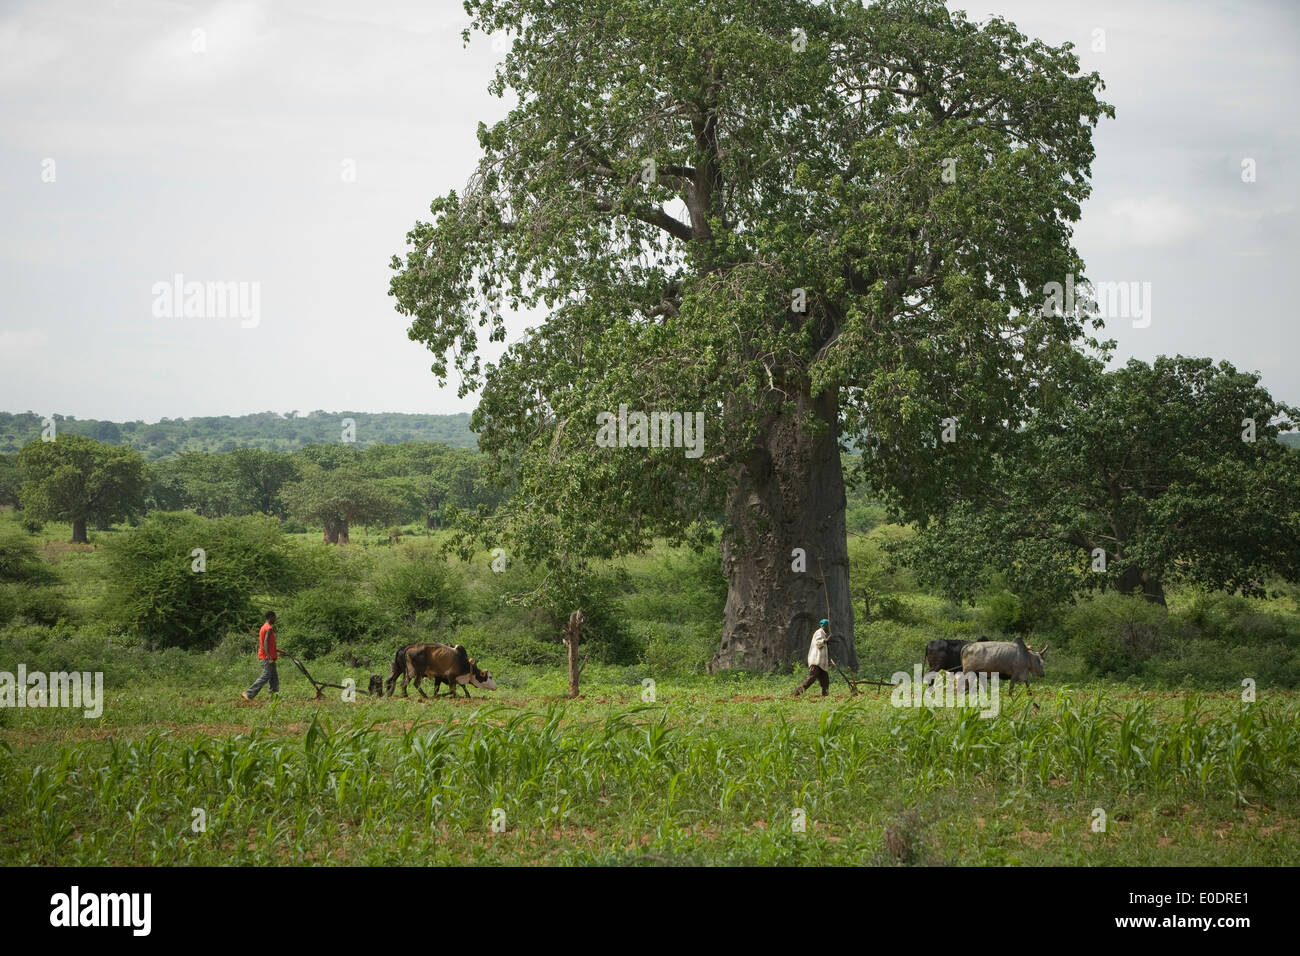 Baobab tree near Dodoma, Tanzania, East Africa. - Stock Image